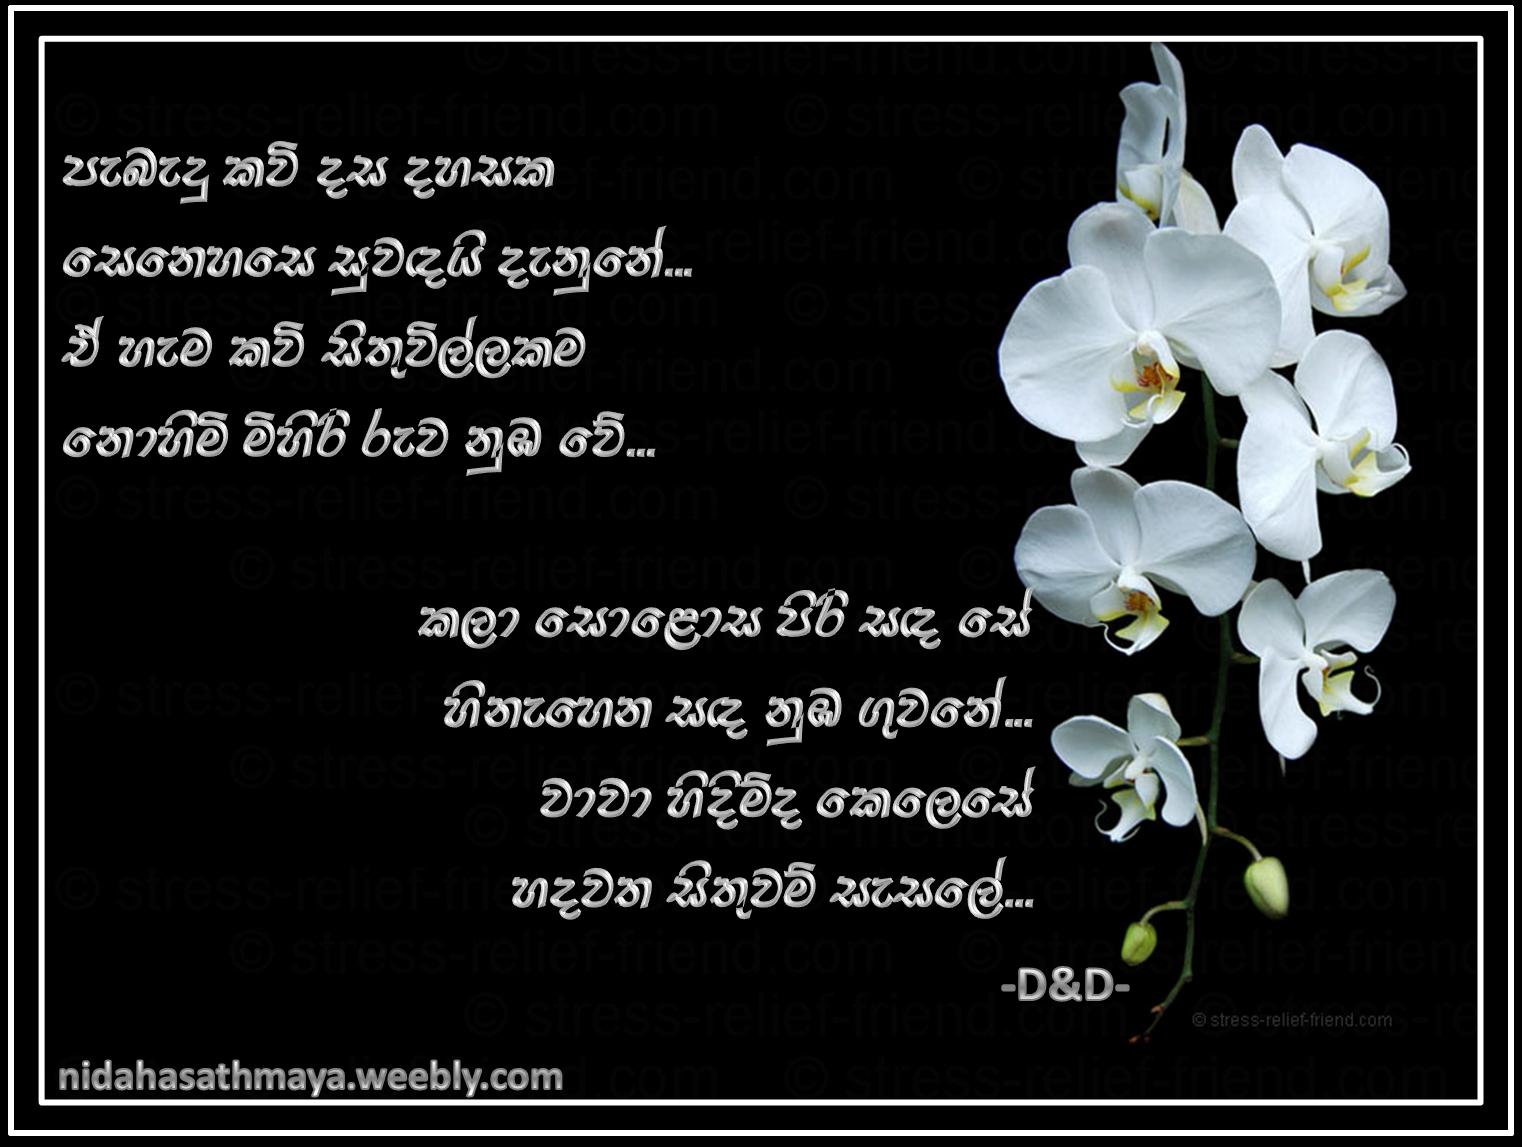 Sad Love Poems In Sinhala Sinhala sad love images holidays oo